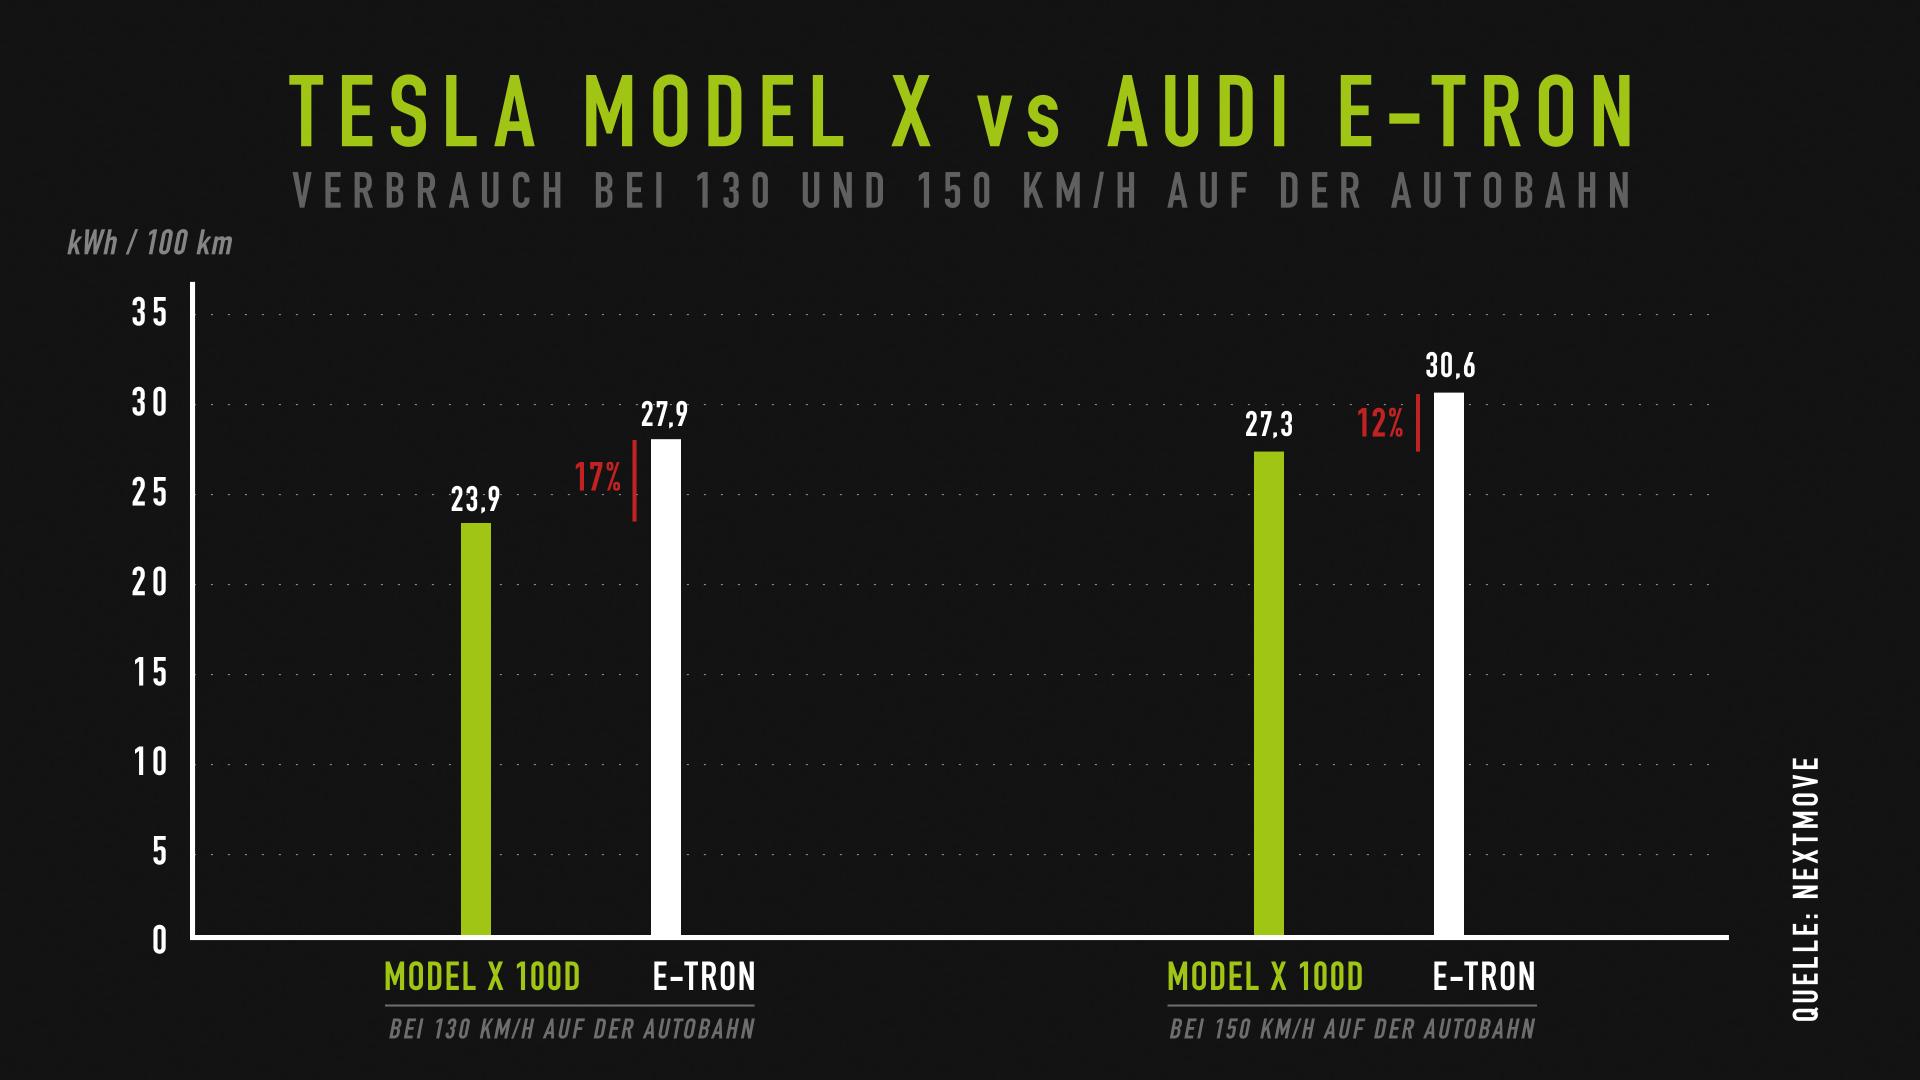 nextmove Verbrauchstest - Model X vs Audi etron bei 130 vs 150 kmh